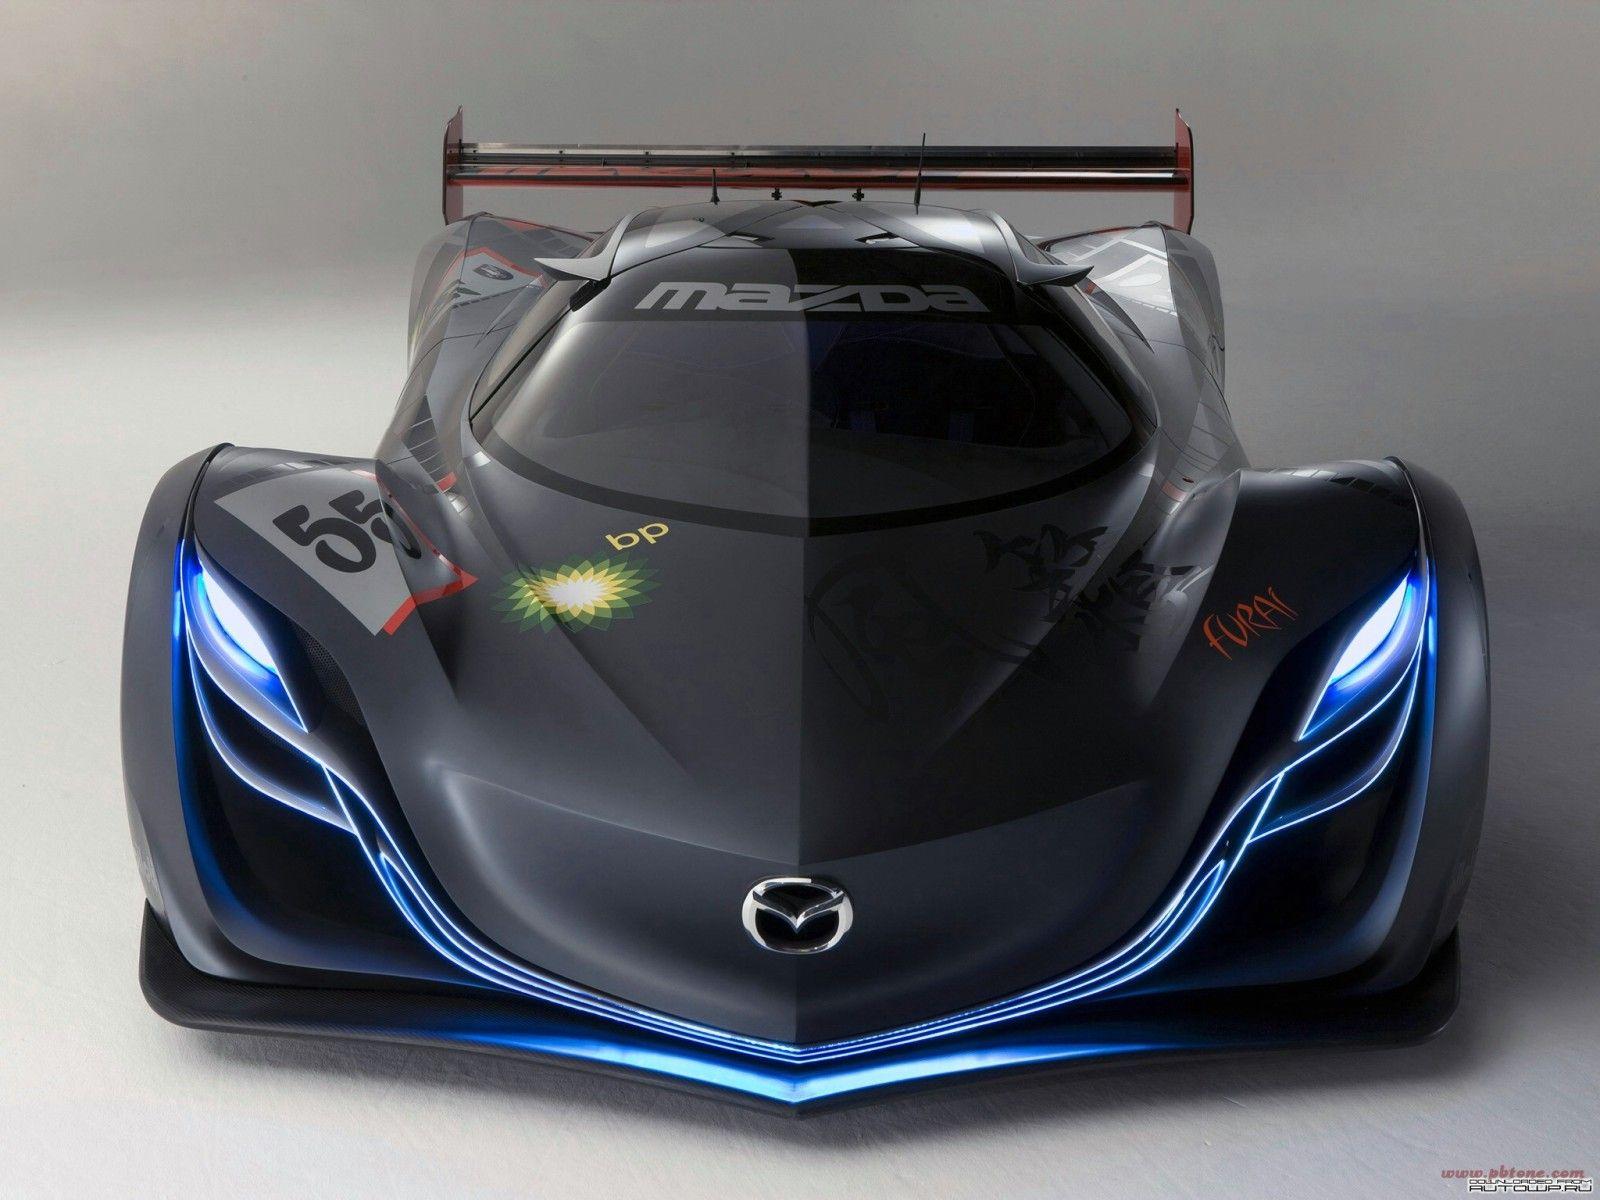 Belles Voiture Les Belles Voiture Pinterest Cars Supercar - Cool mazda cars